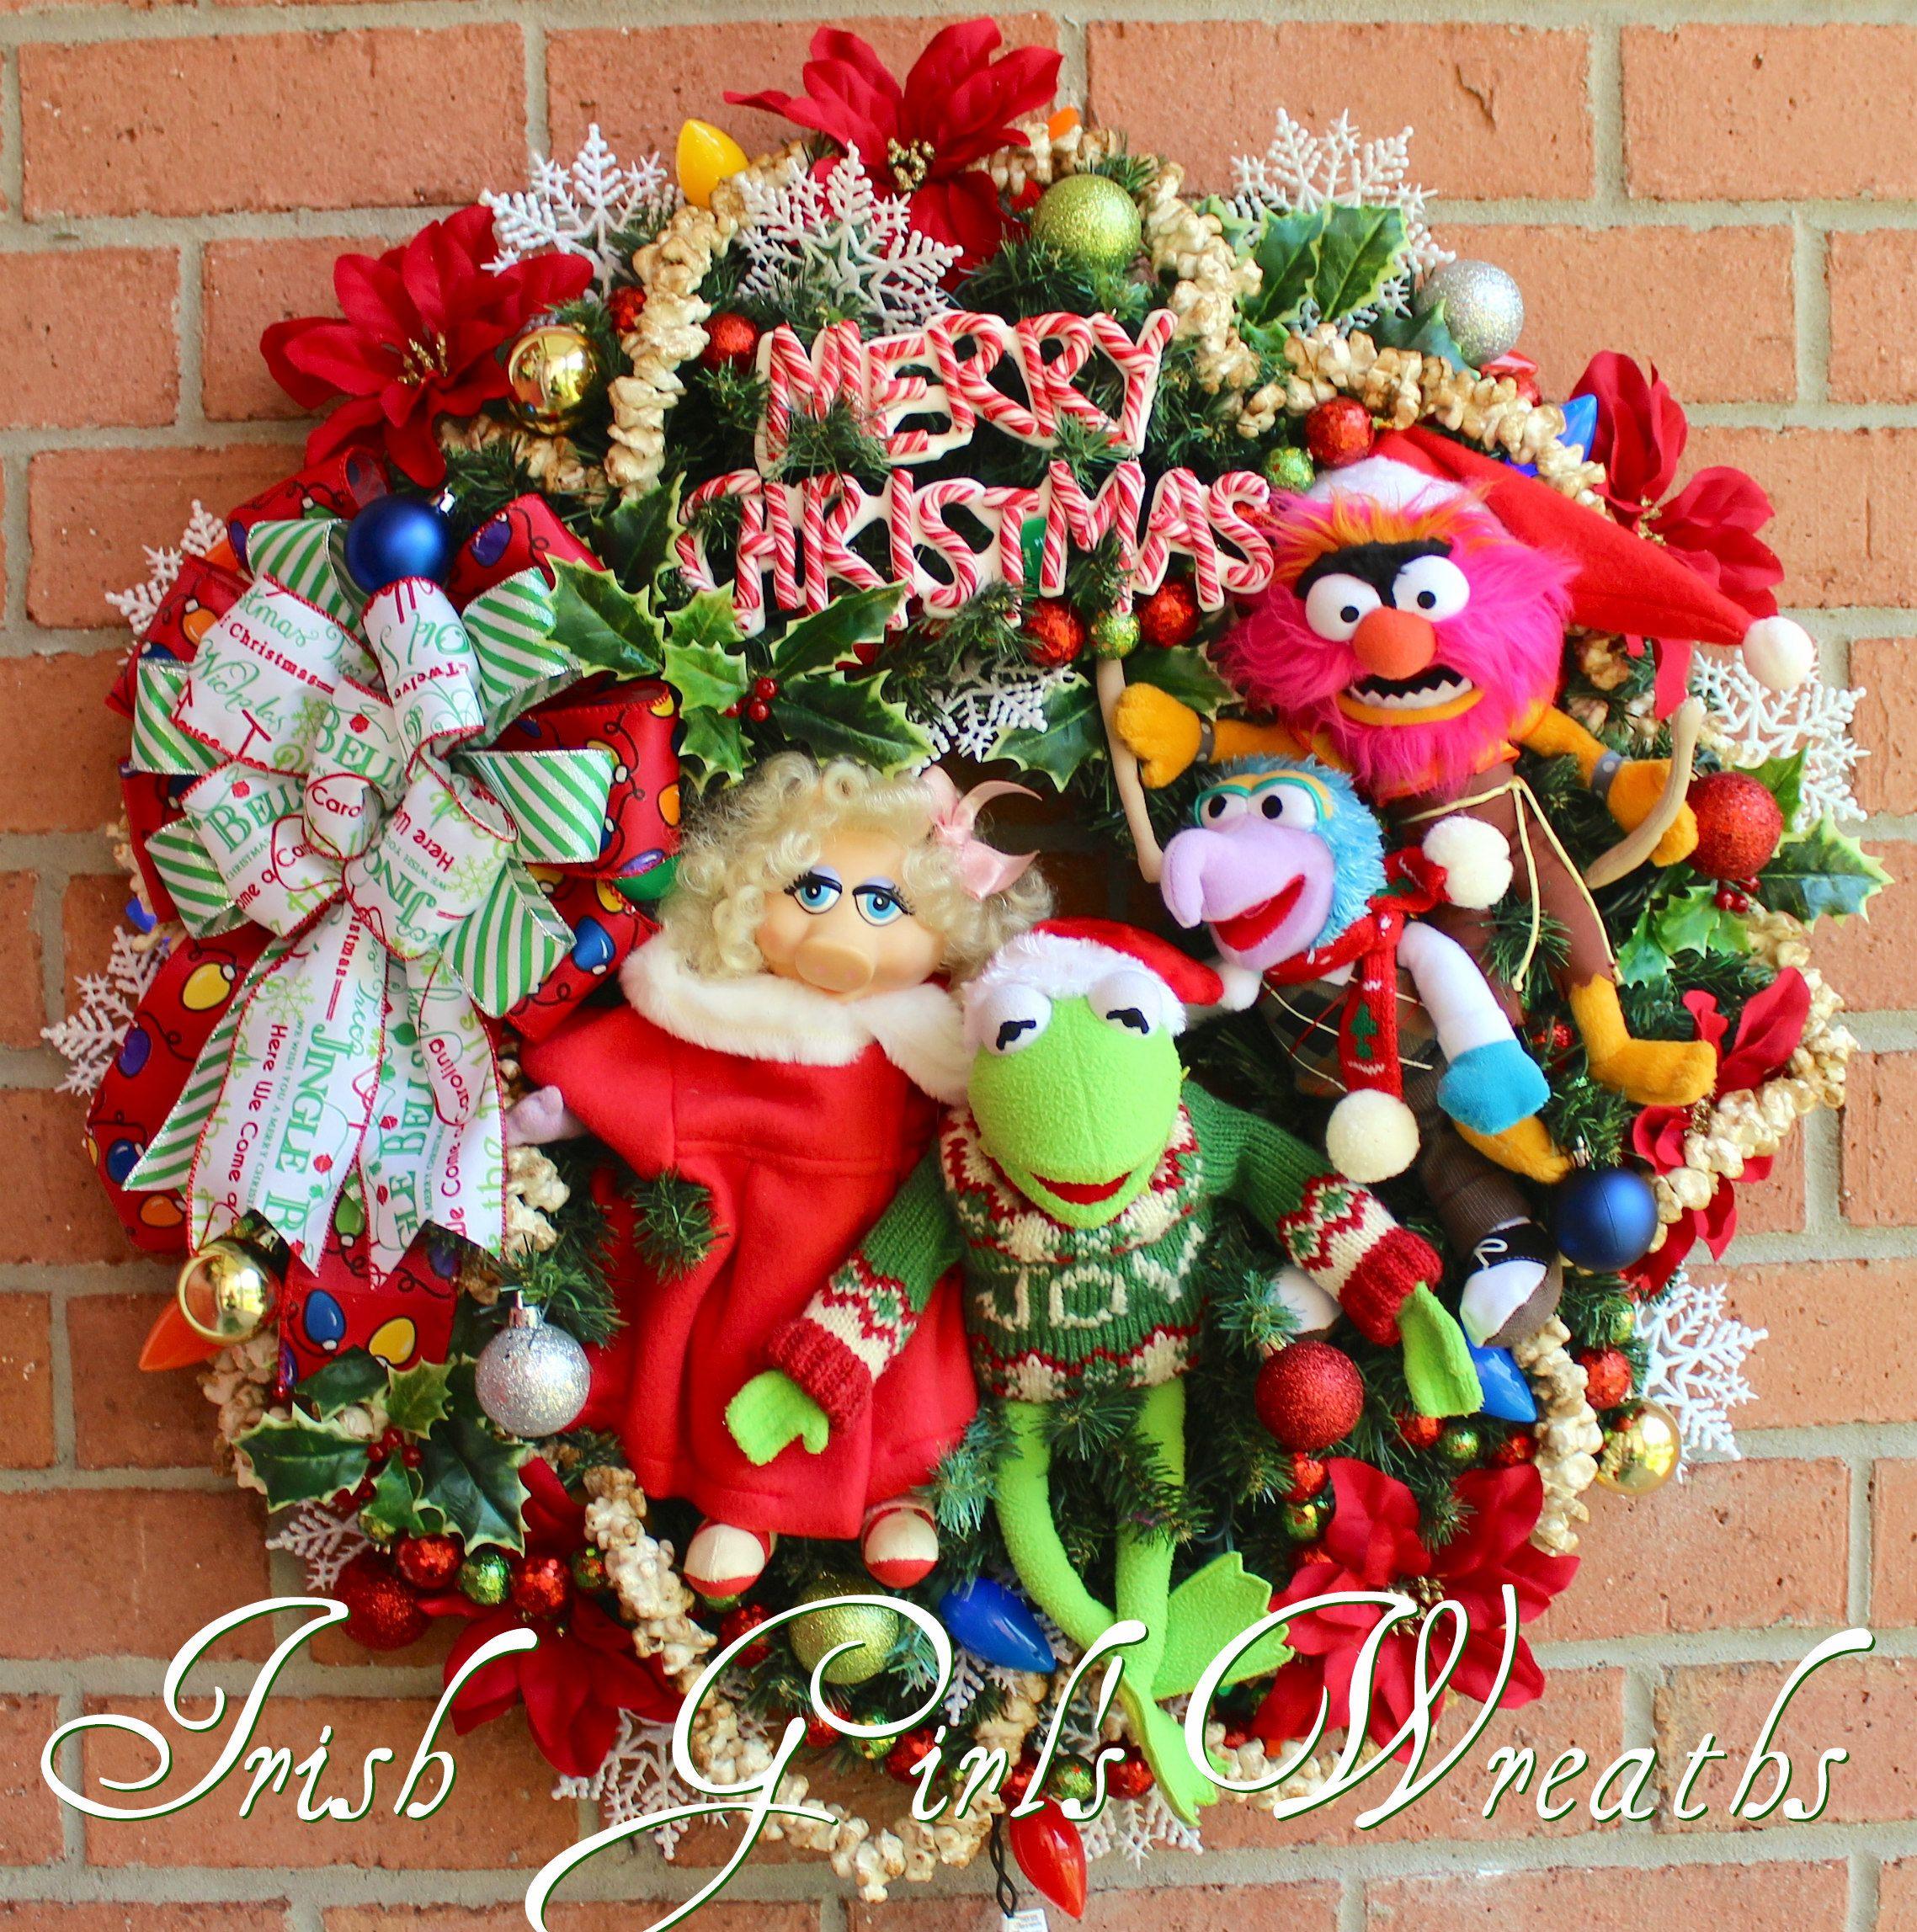 Muppets Merry Christmas Wreath starring Kermit, Miss Piggy, Gonzo ...